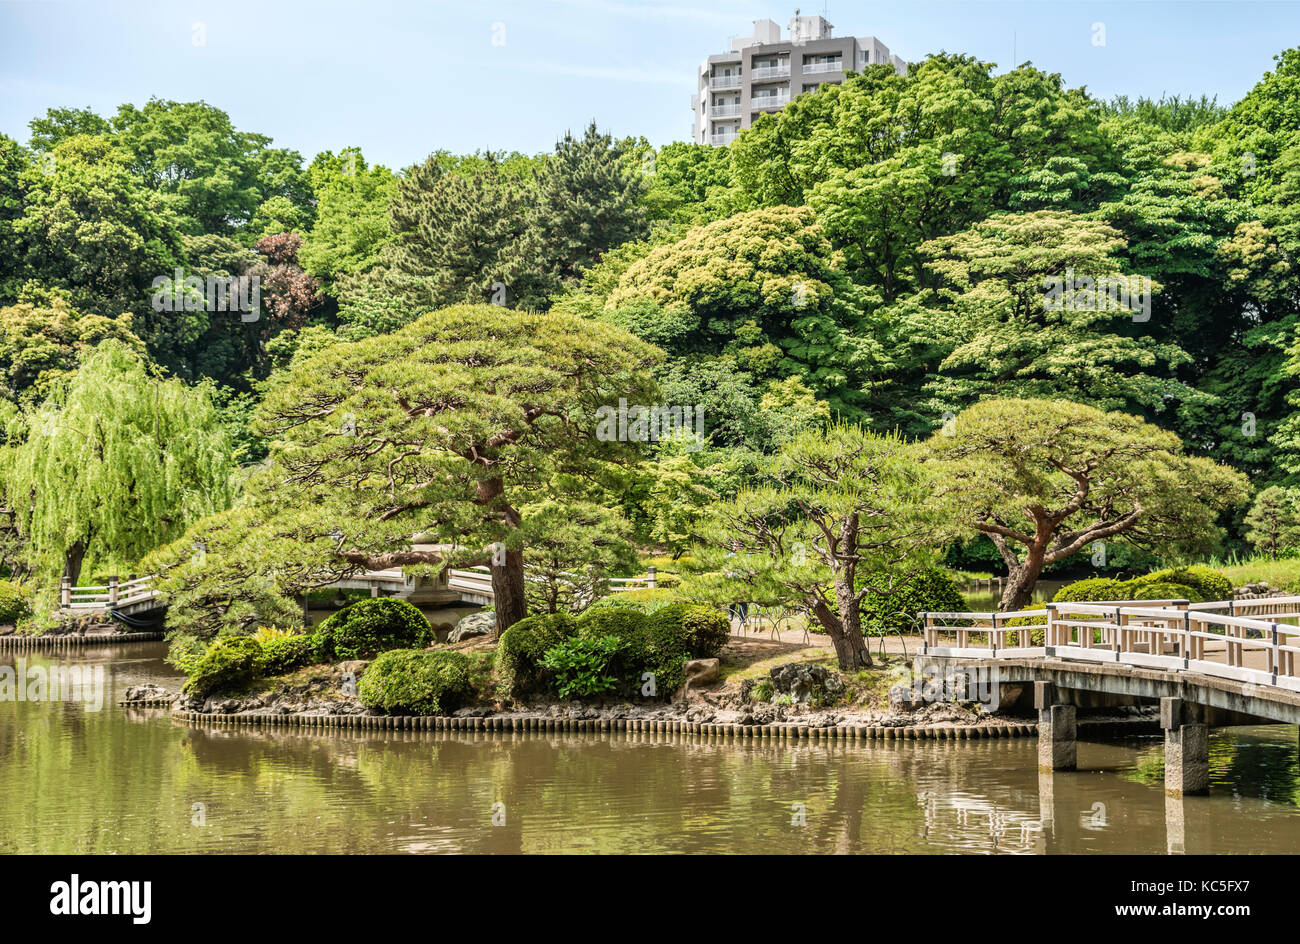 Asiatischer Garten Bäume Japanischer Garten Stockfotos And